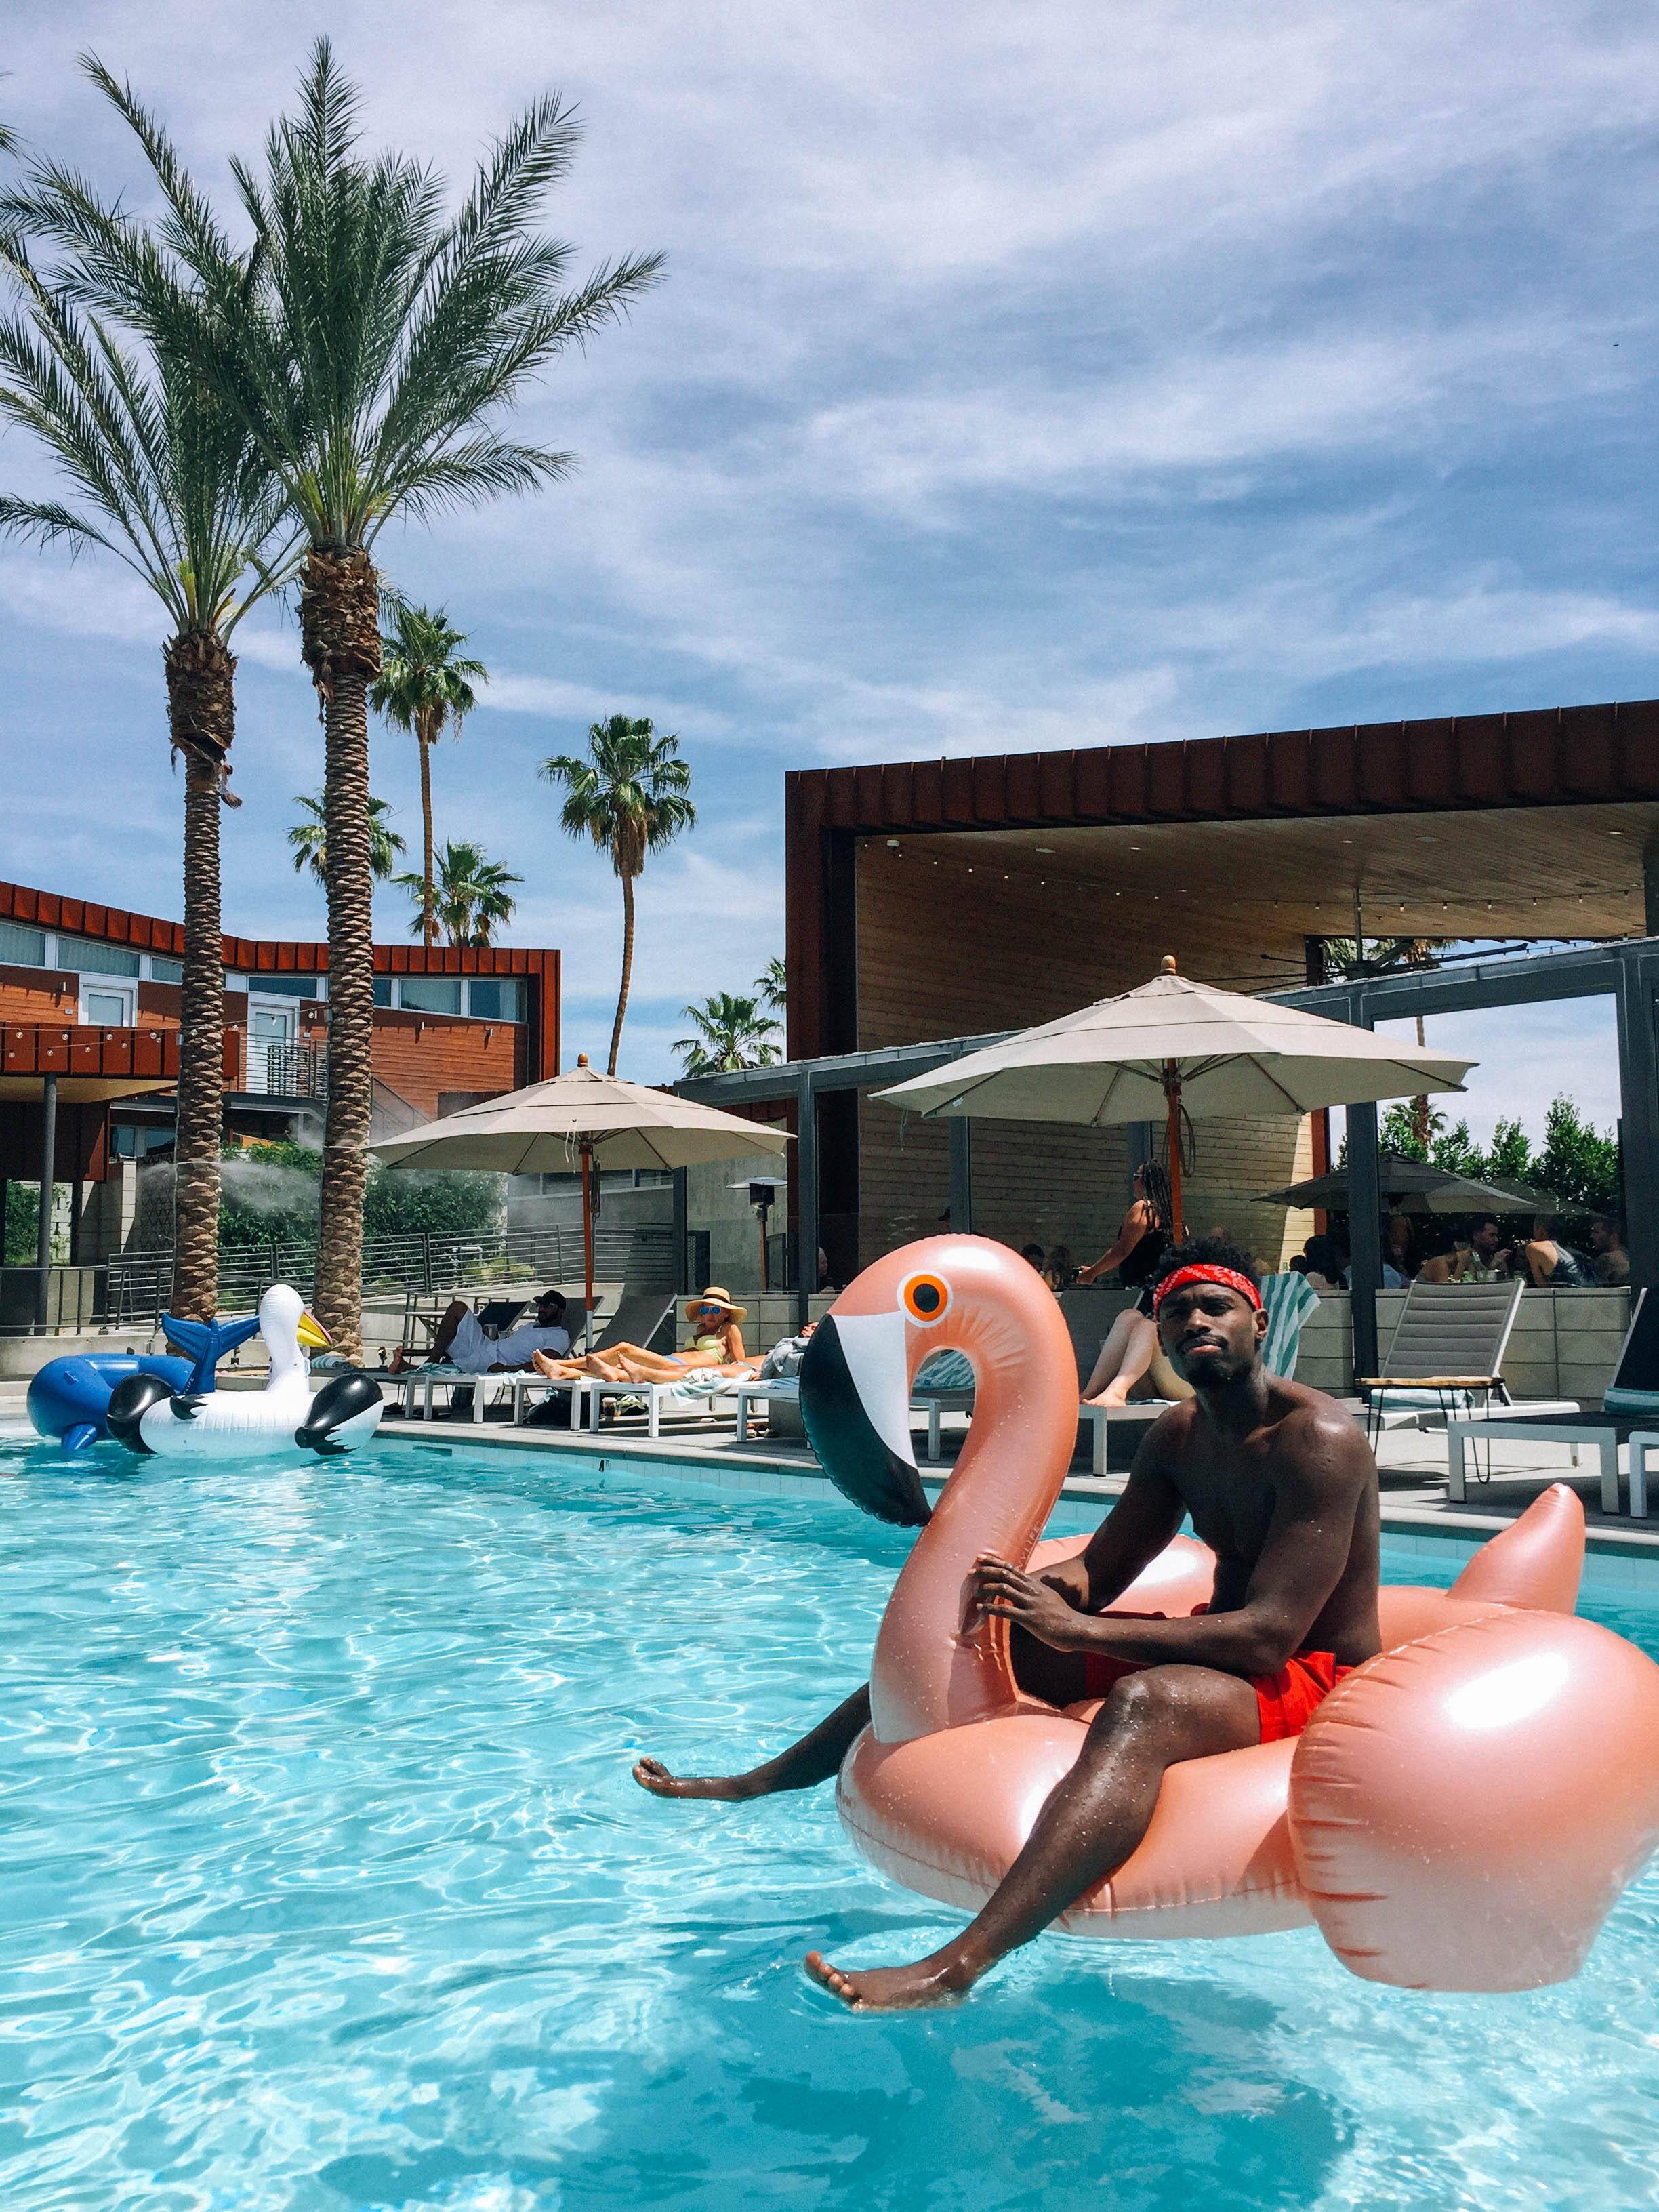 Coachella Festival Pool Parties